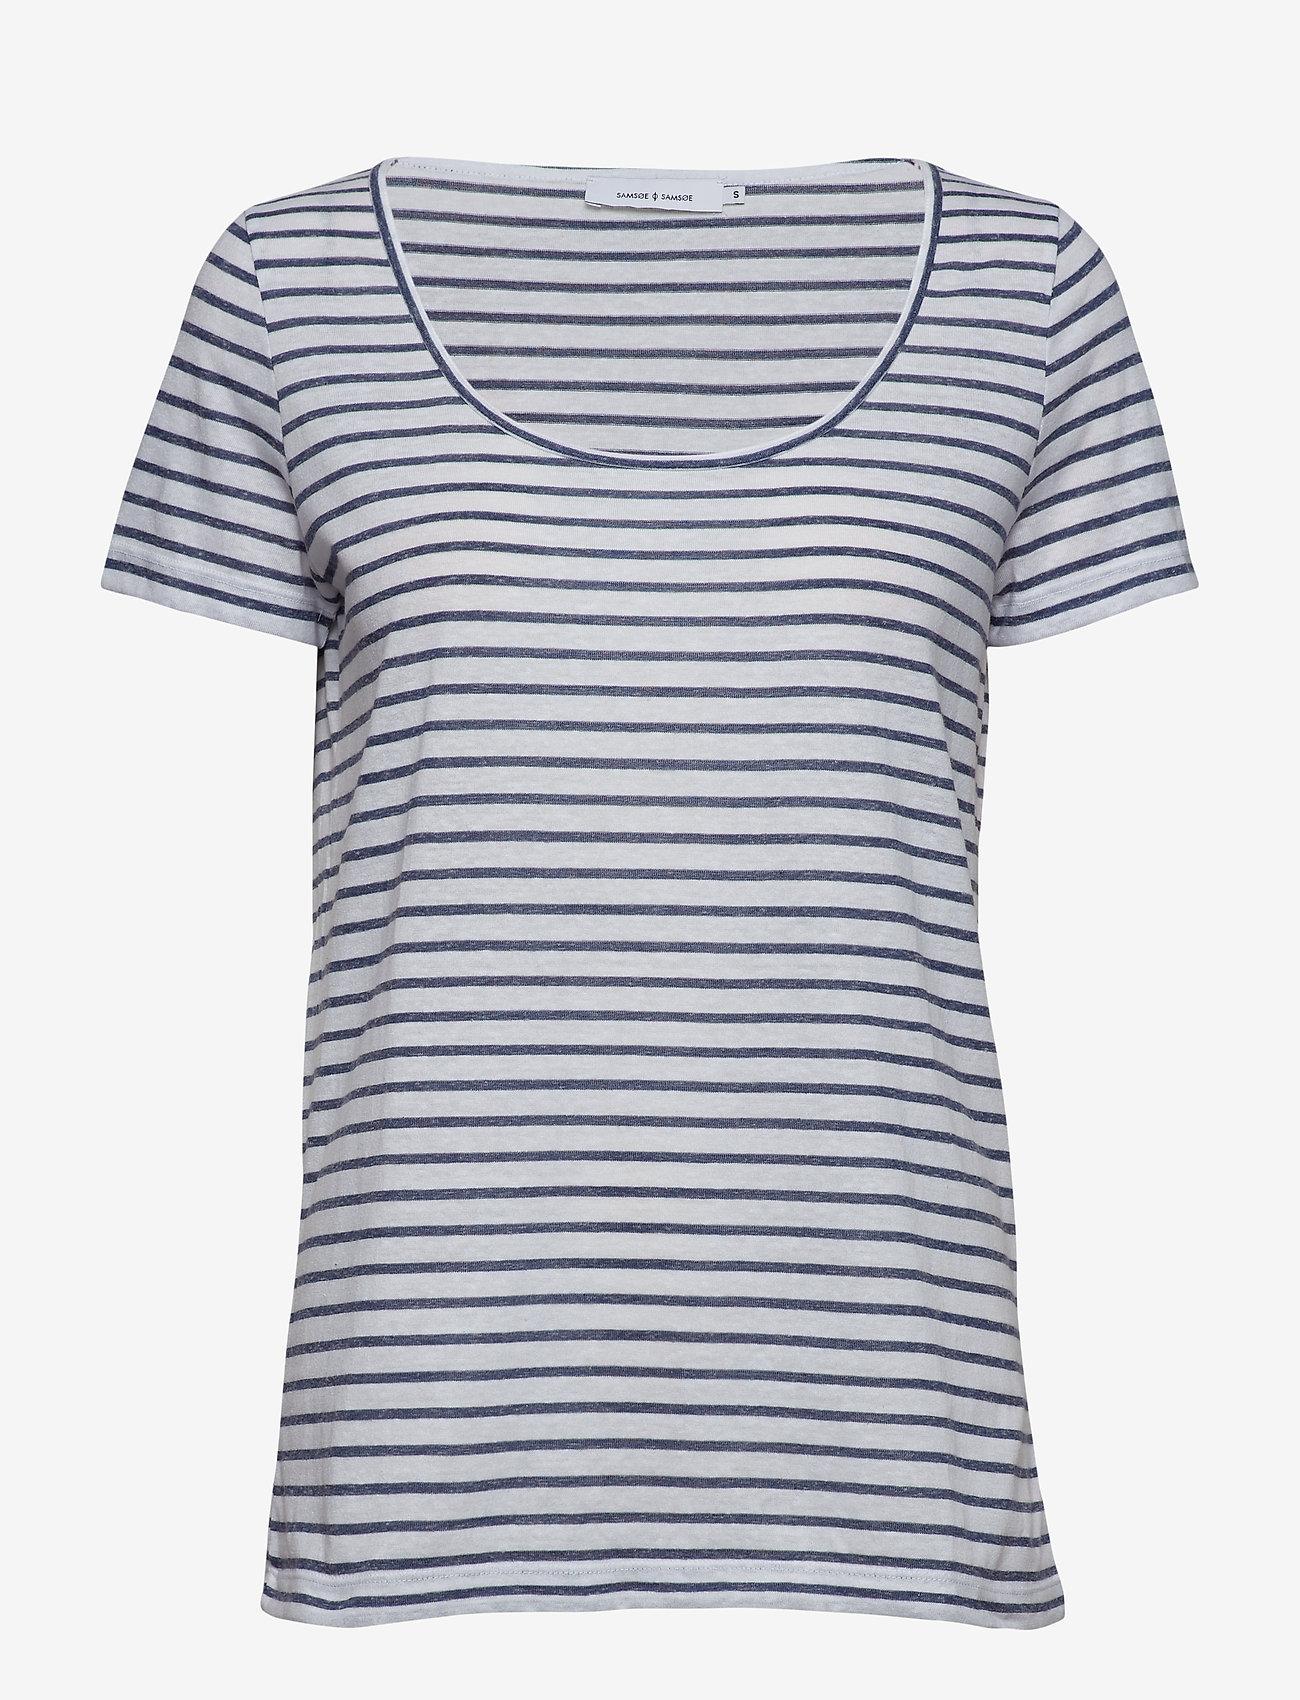 Samsøe Samsøe - Nobel tee stripe 3173 - gestreifte t-shirts - 3173 blue stripe - 0